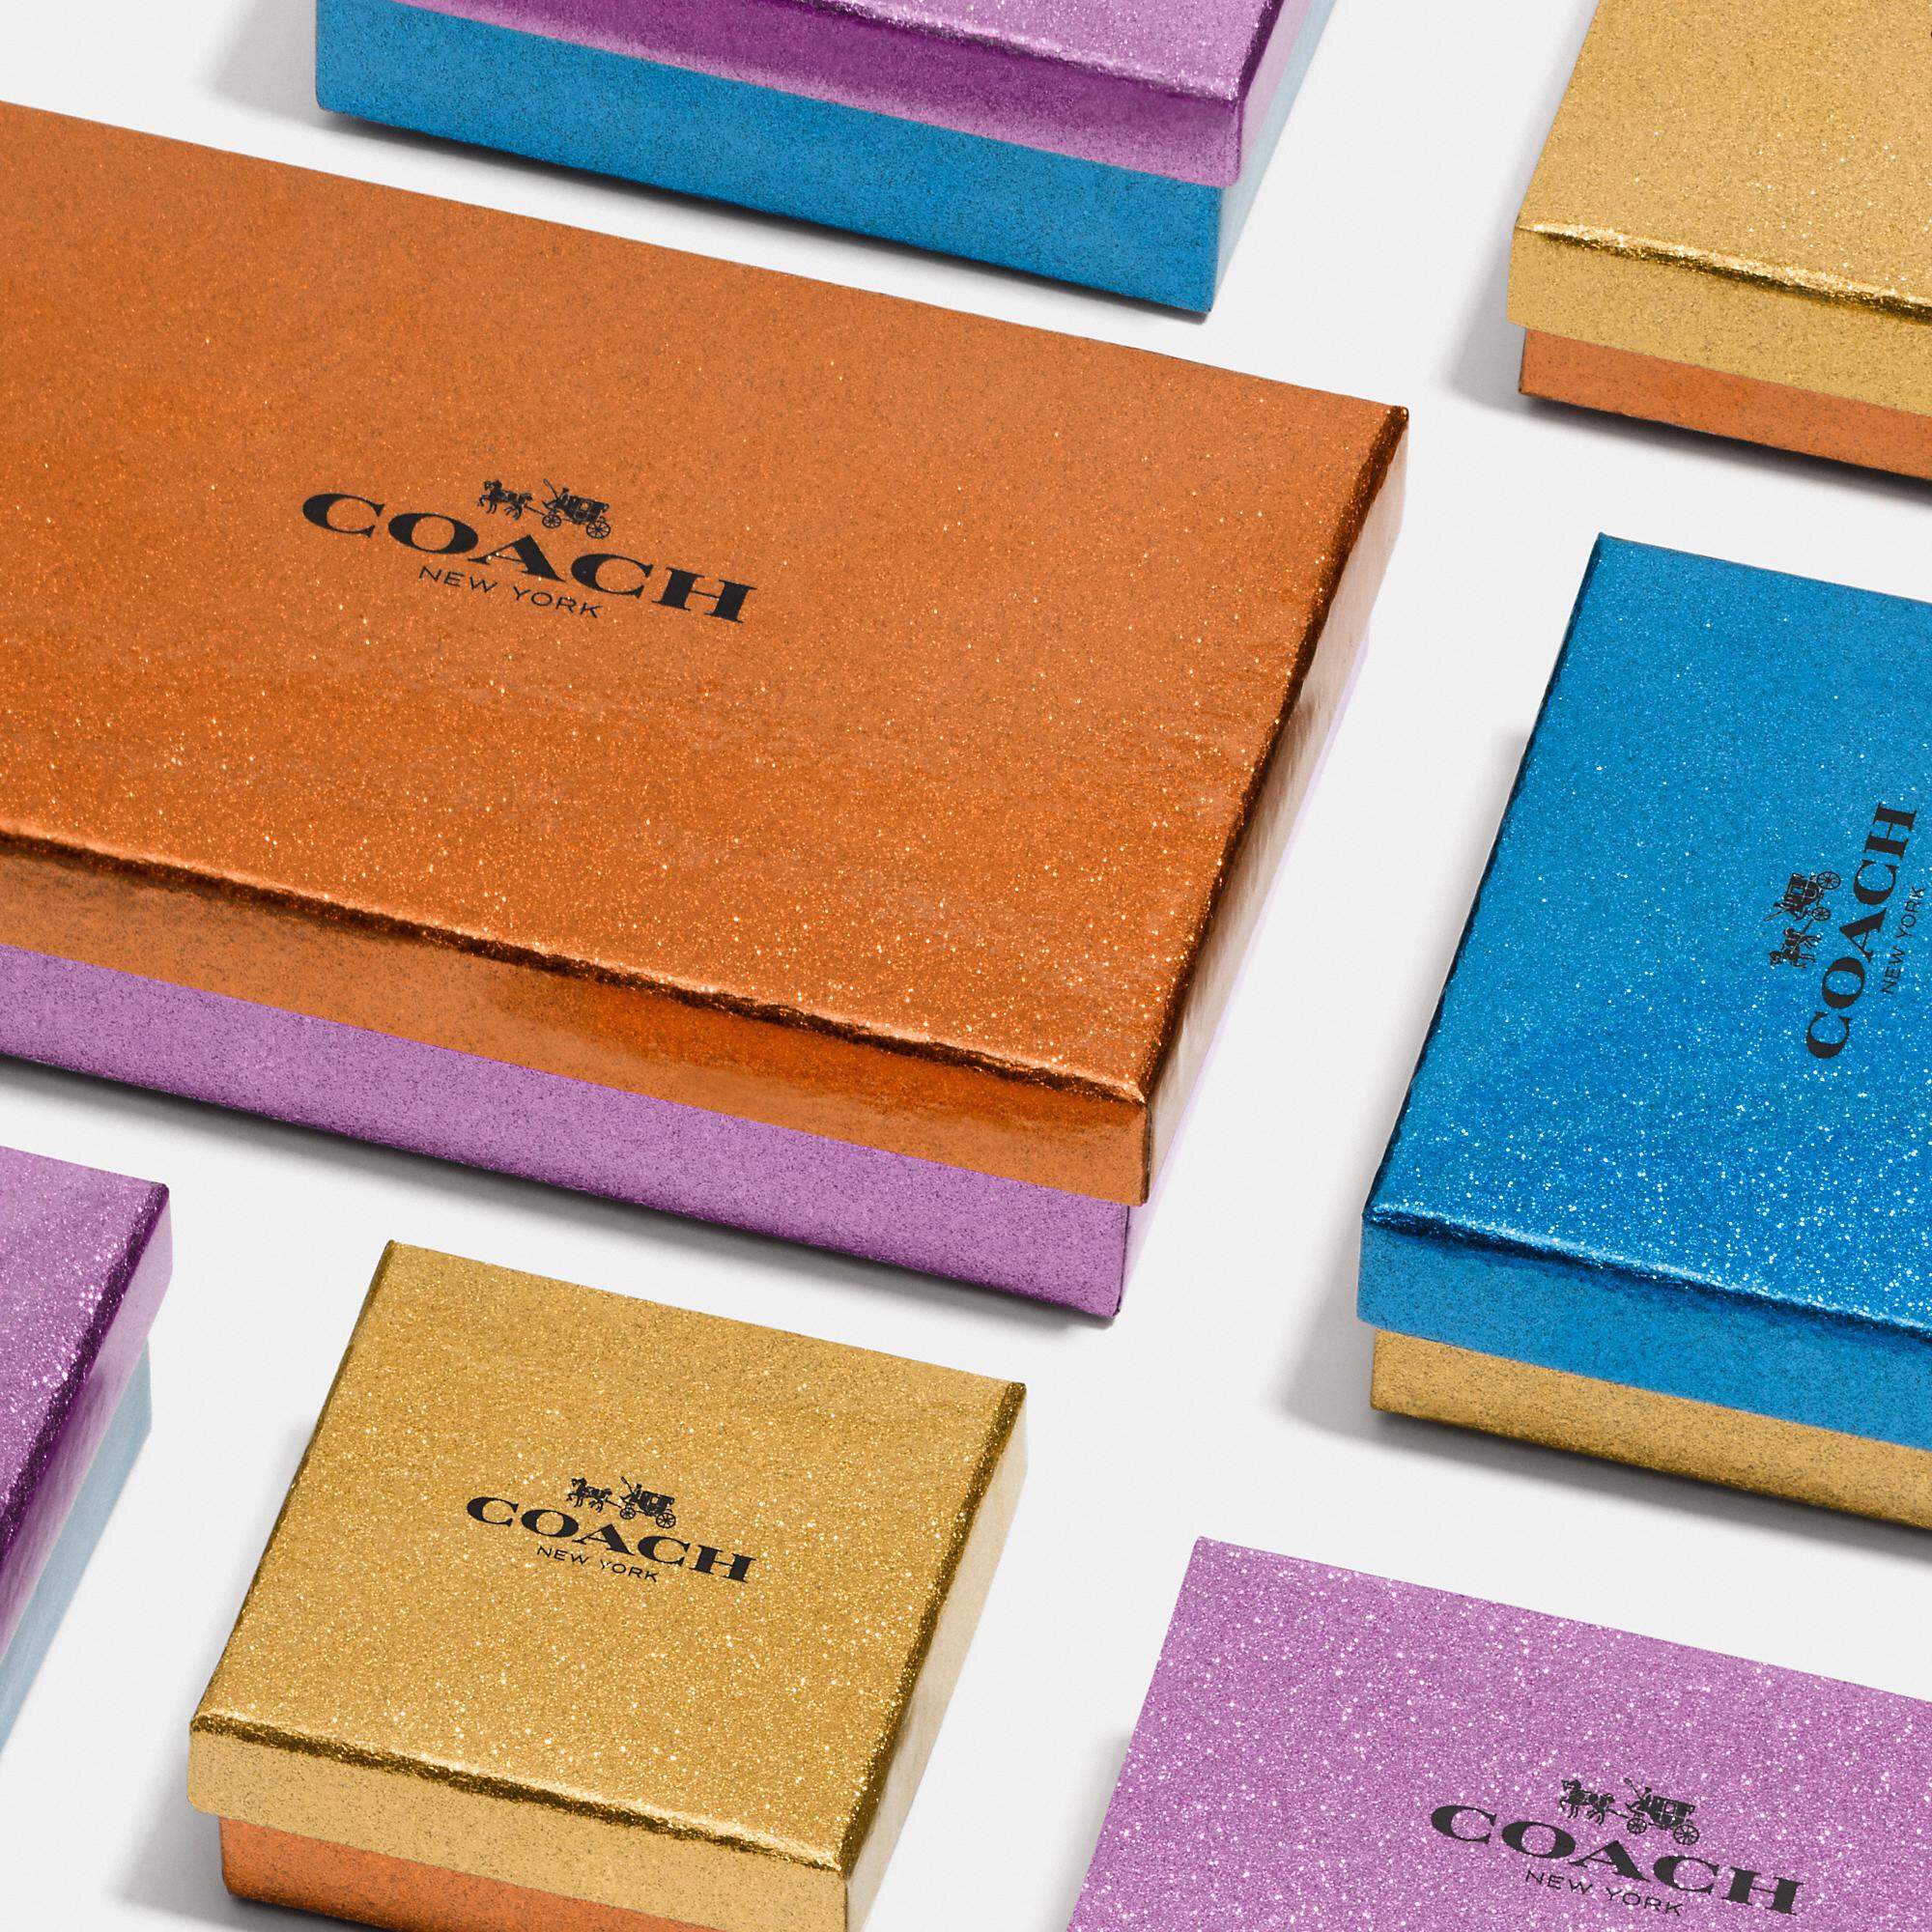 Coach-Boxes-结构 - 零售包装 - 闪光 - 假期-2.jpeg